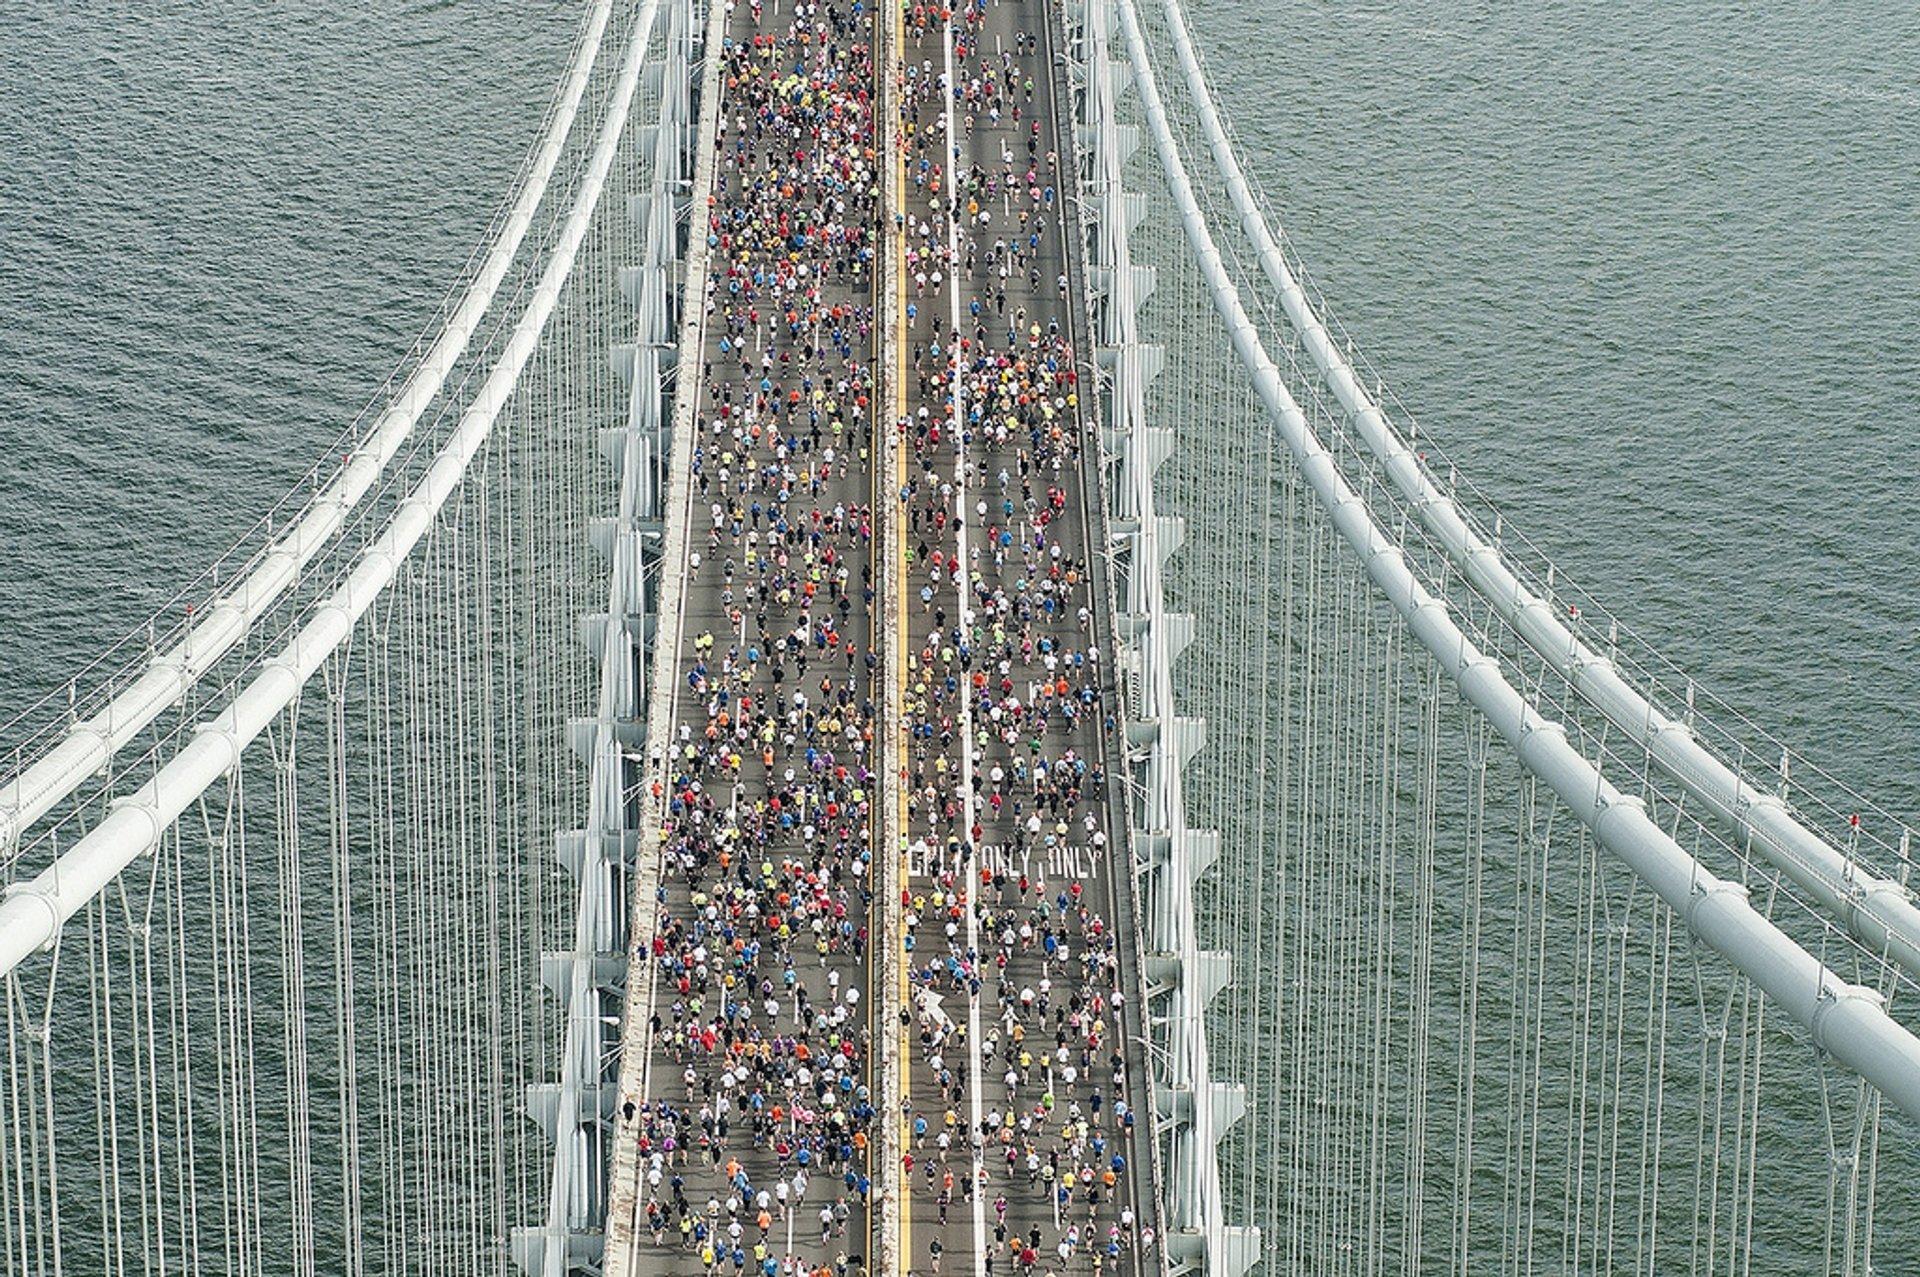 New York City Marathon in New York 2020 - Best Time